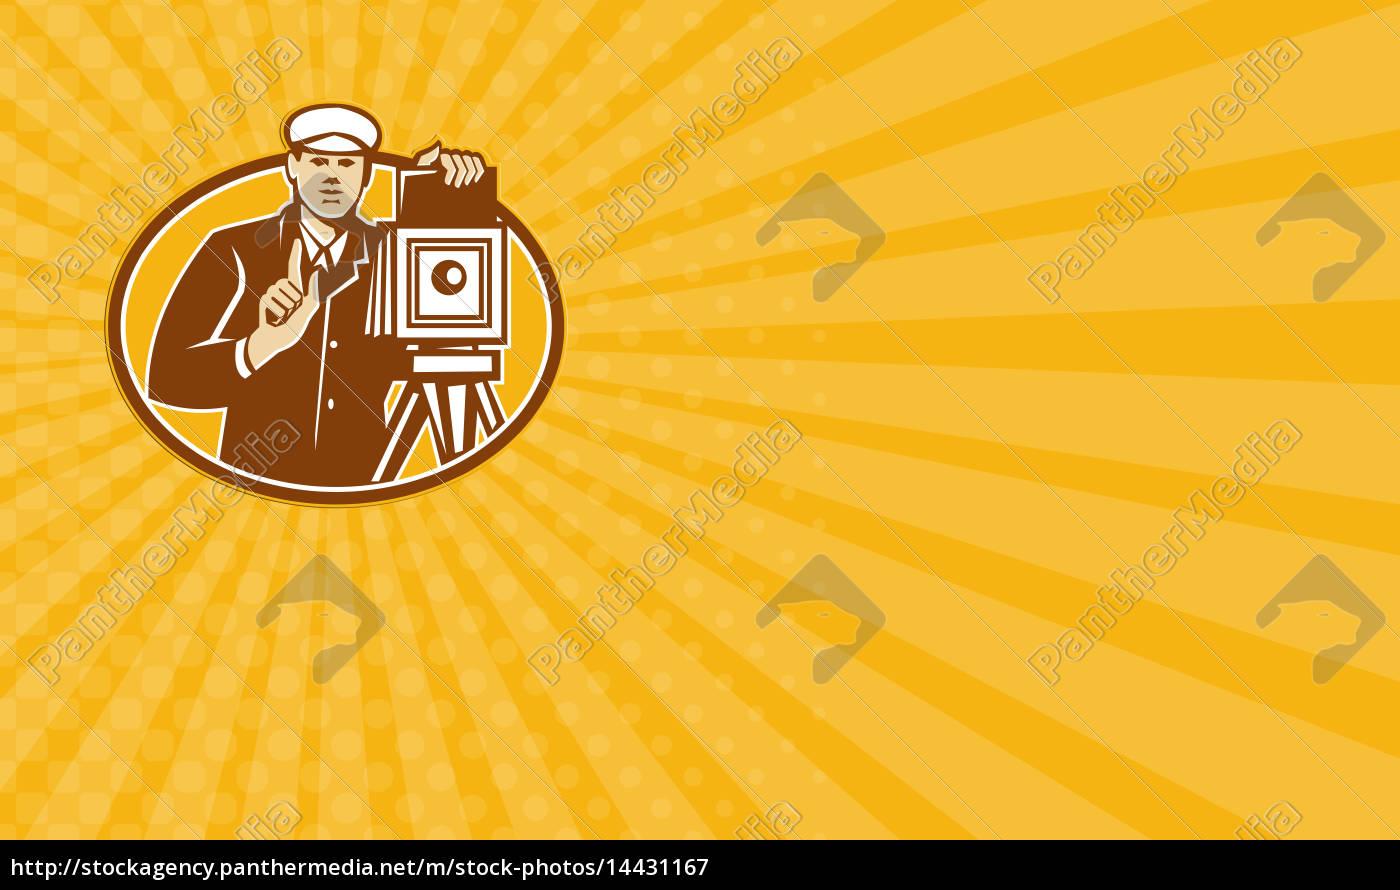 Stockfoto 14431167 Visitenkarten Fotograf Vintage Camera Front Retro